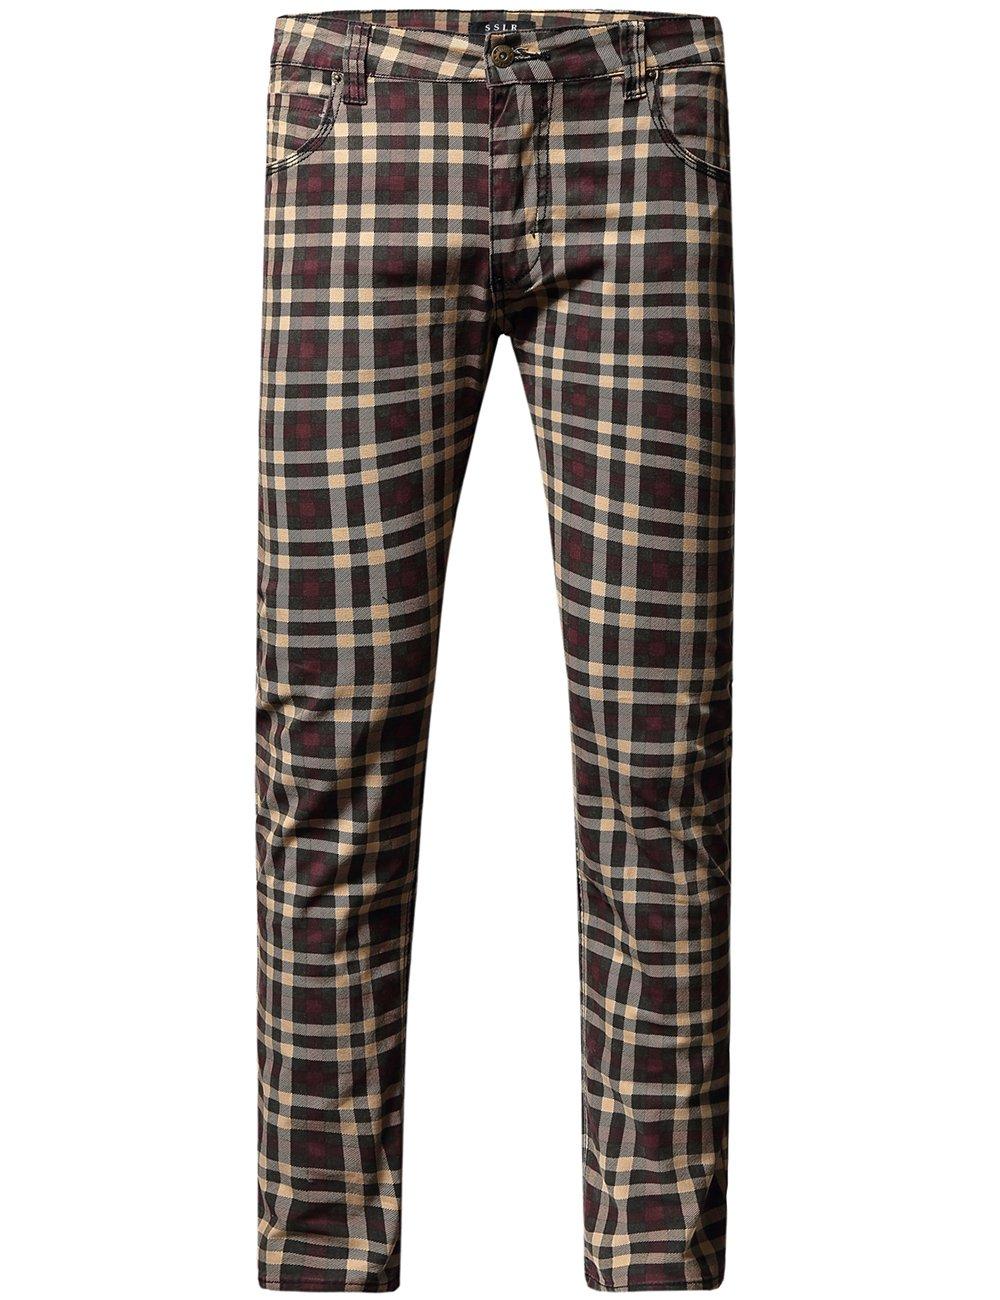 SSLR Men's Checkered Straight Fit Denim Jeans (W36 x L32, Light Khaki(Update))